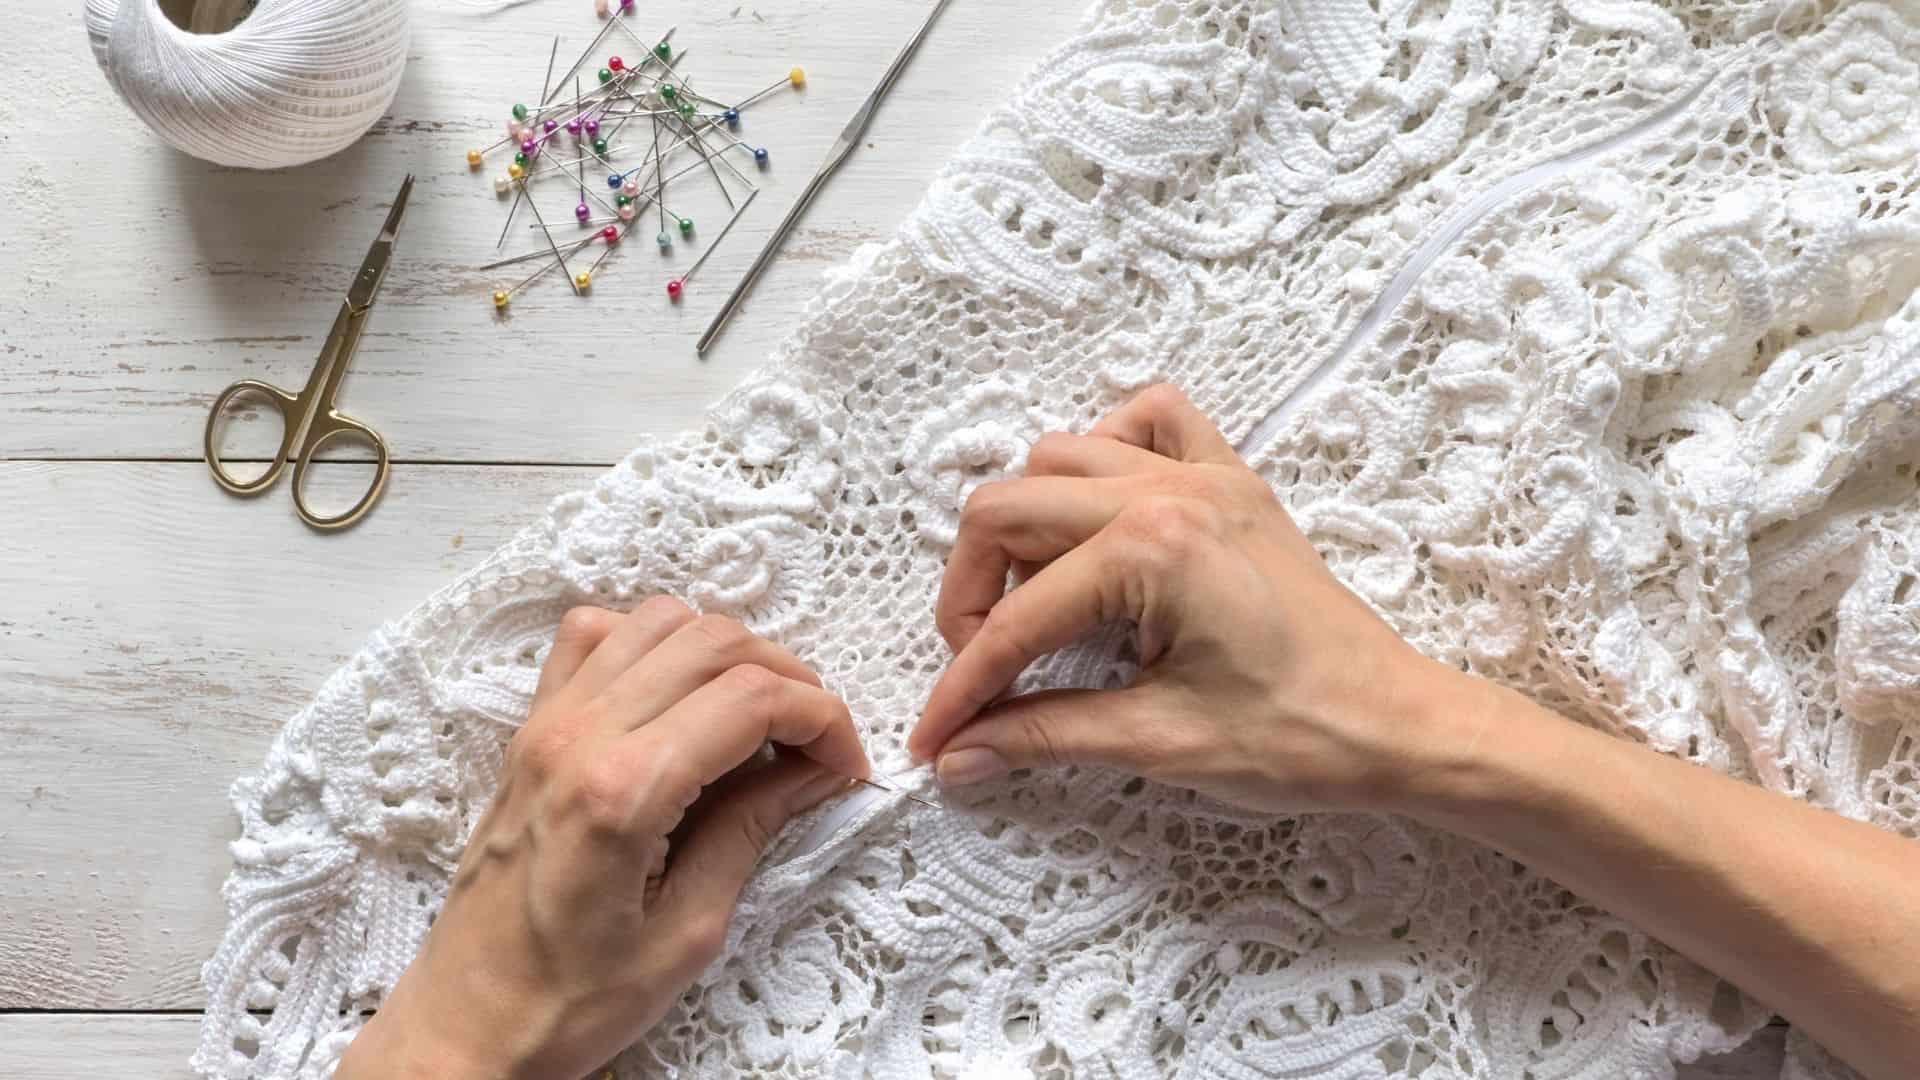 business woman designing a wedding dress